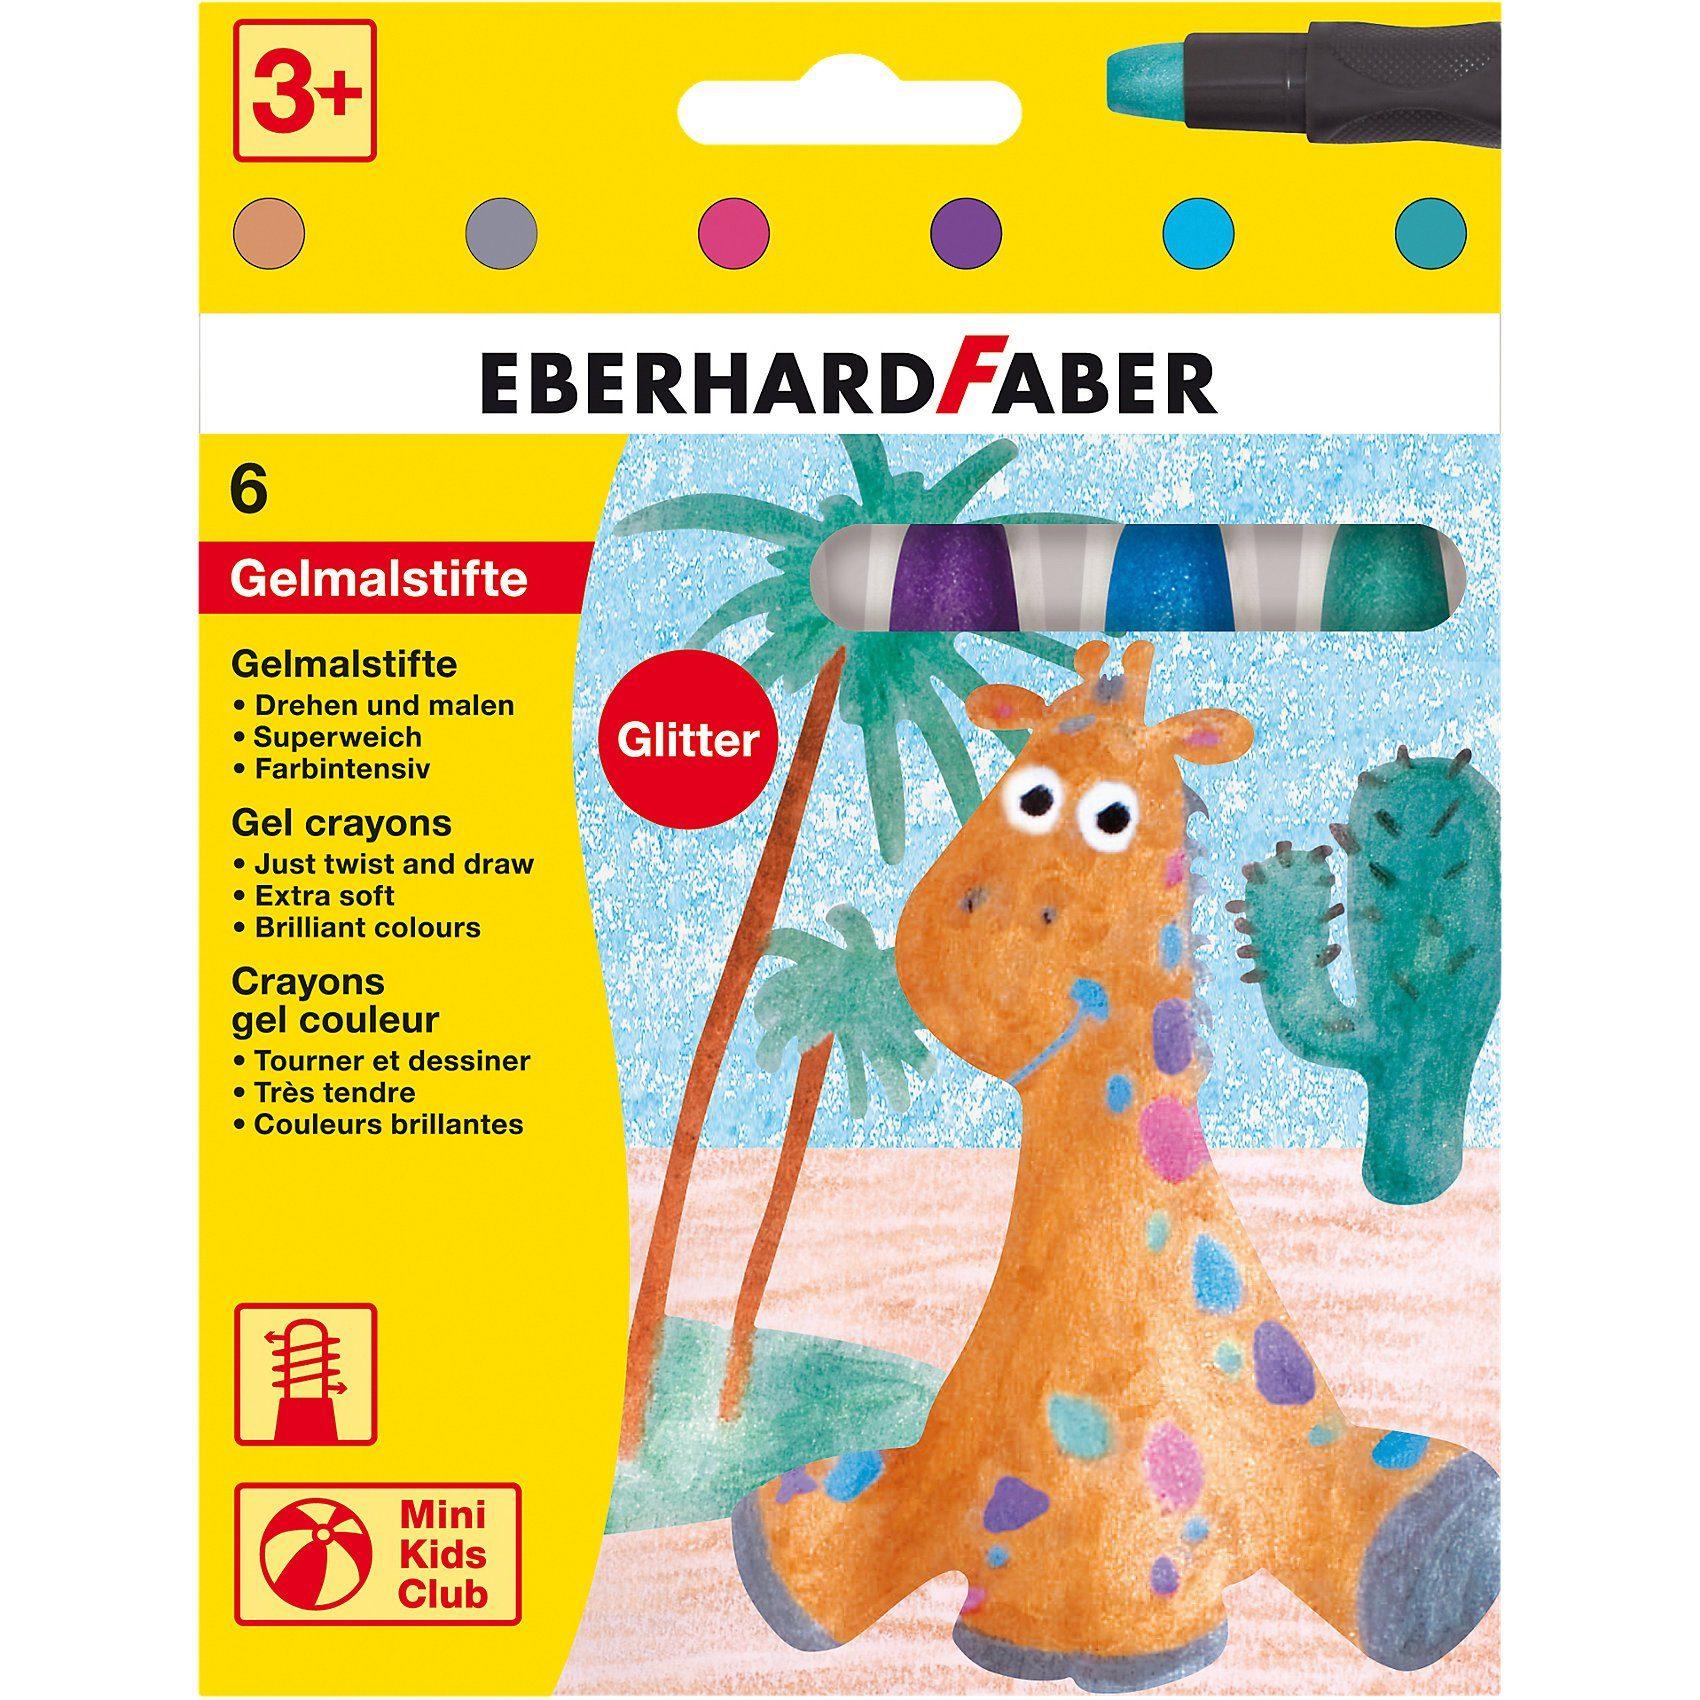 Eberhard Faber Mini Kids Gelmalstifte/Fenstermaler, 6 Glitter-Farben